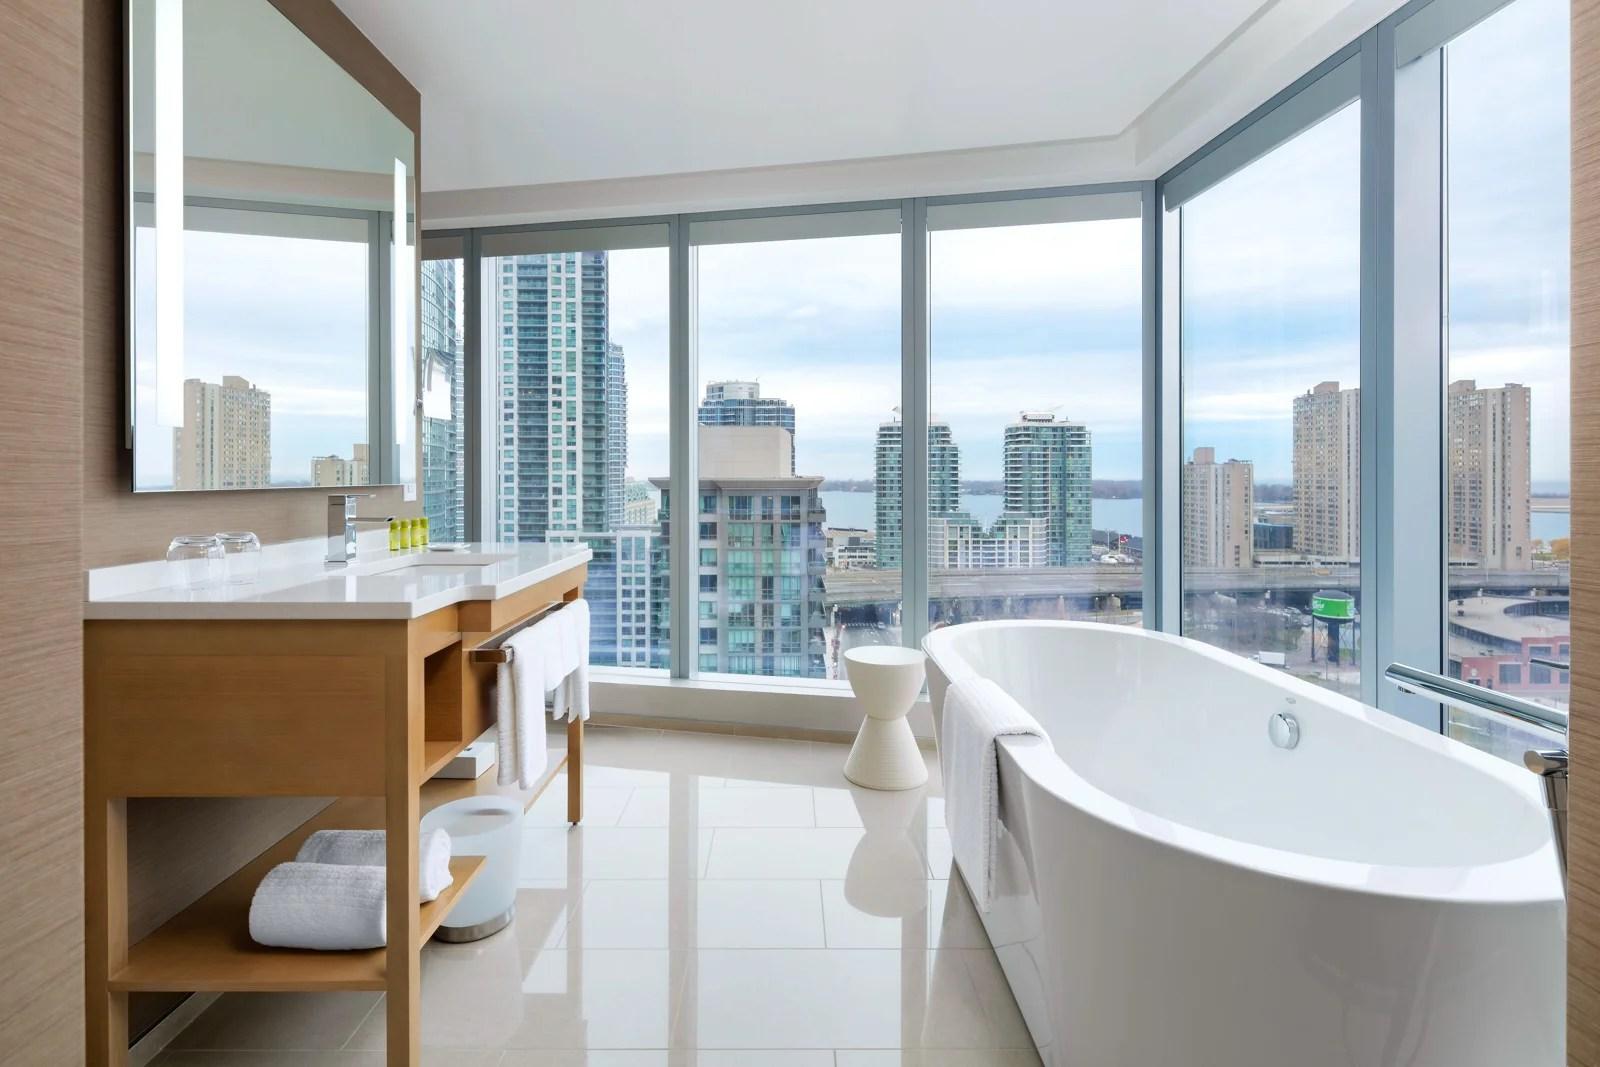 The Delta Toronto Corner Skyline Soaker room. (Photo courtesy Delta Hotels)